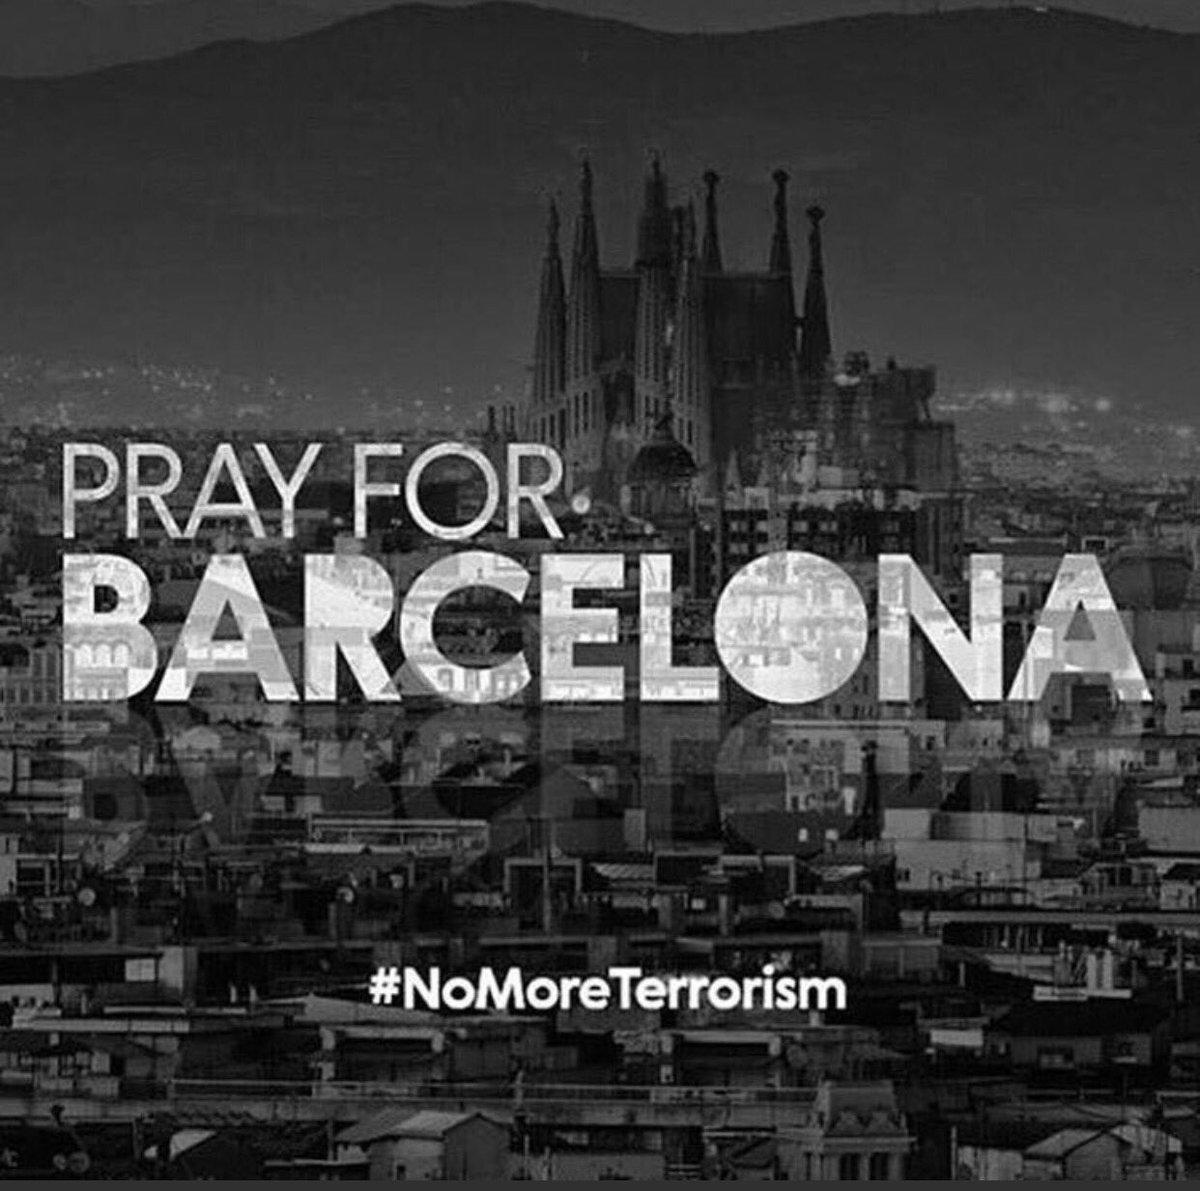 Trencada, horroritzada.                    Força Barcelona! https://t.co/GcX8eFa14d